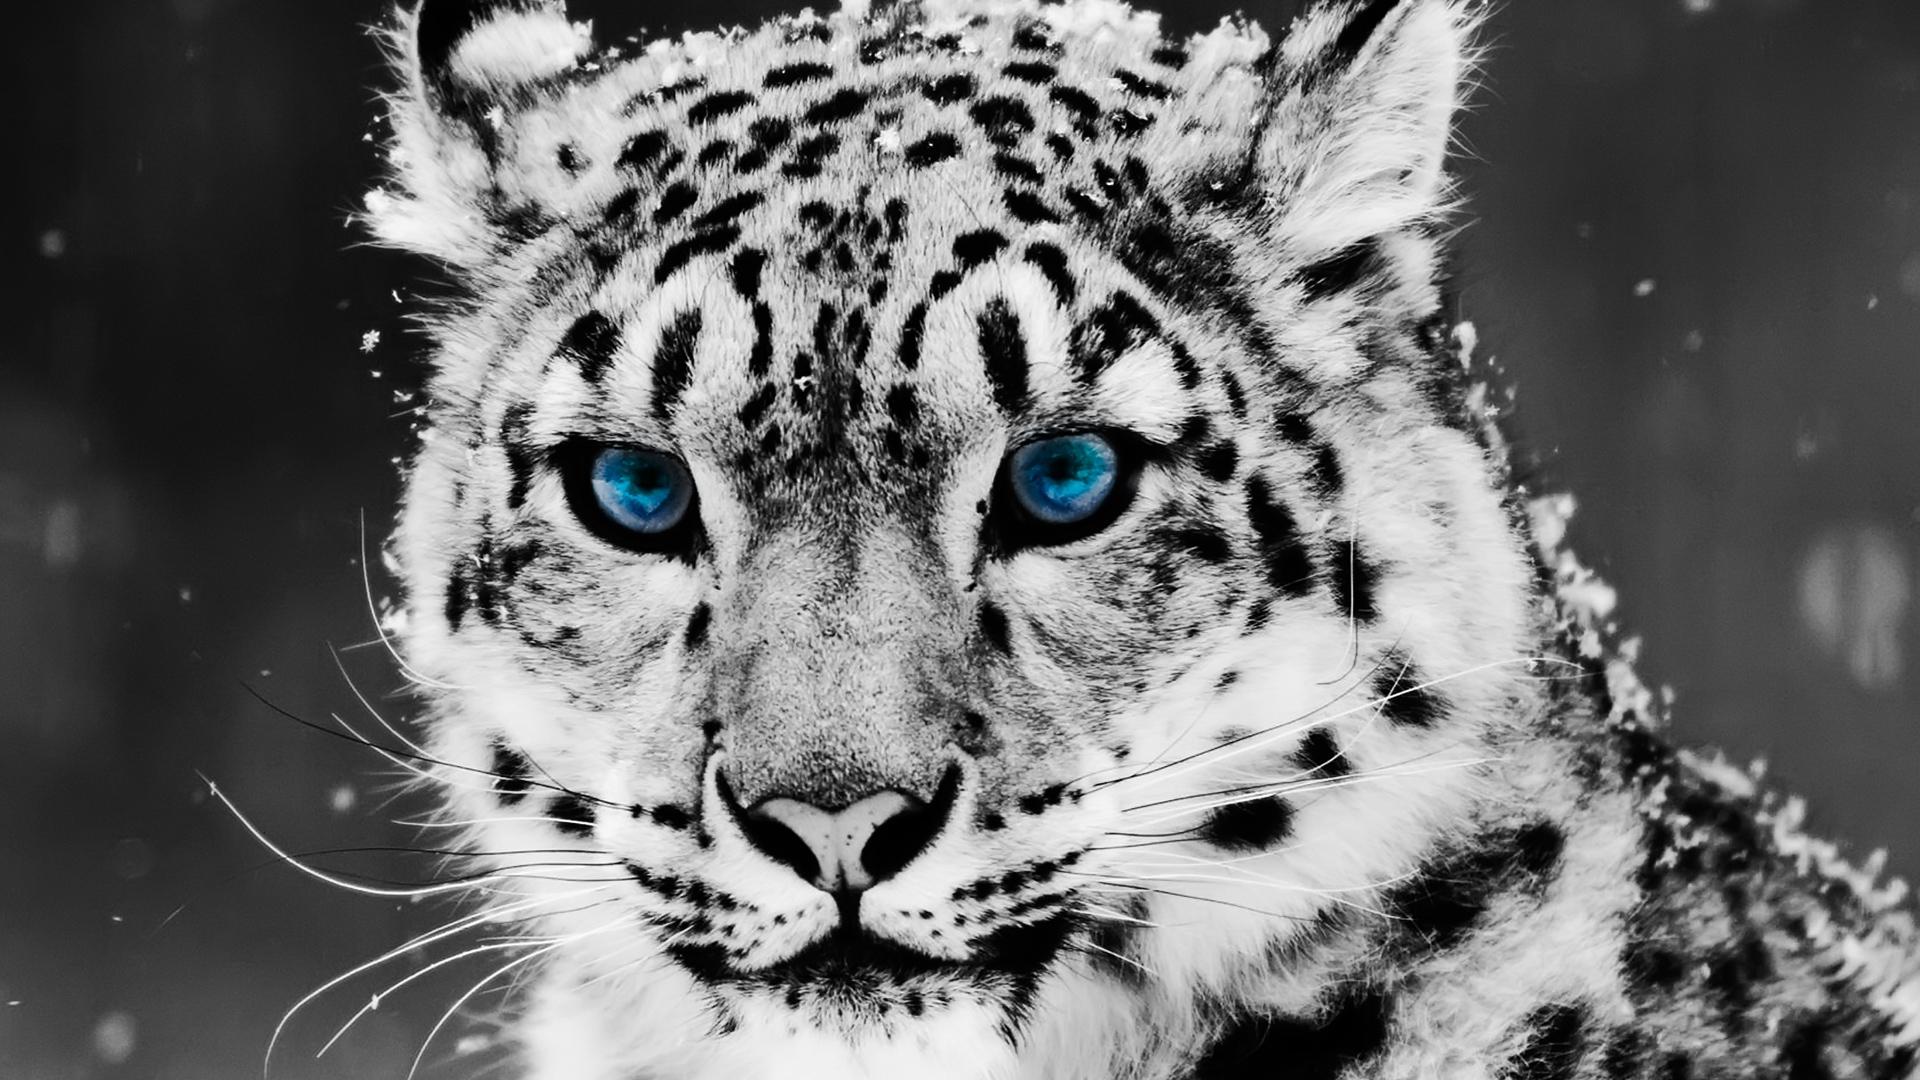 Download Animals Snow Leopard Wallpaper 1920x1080 Full HD Wallpapers 1920x1080